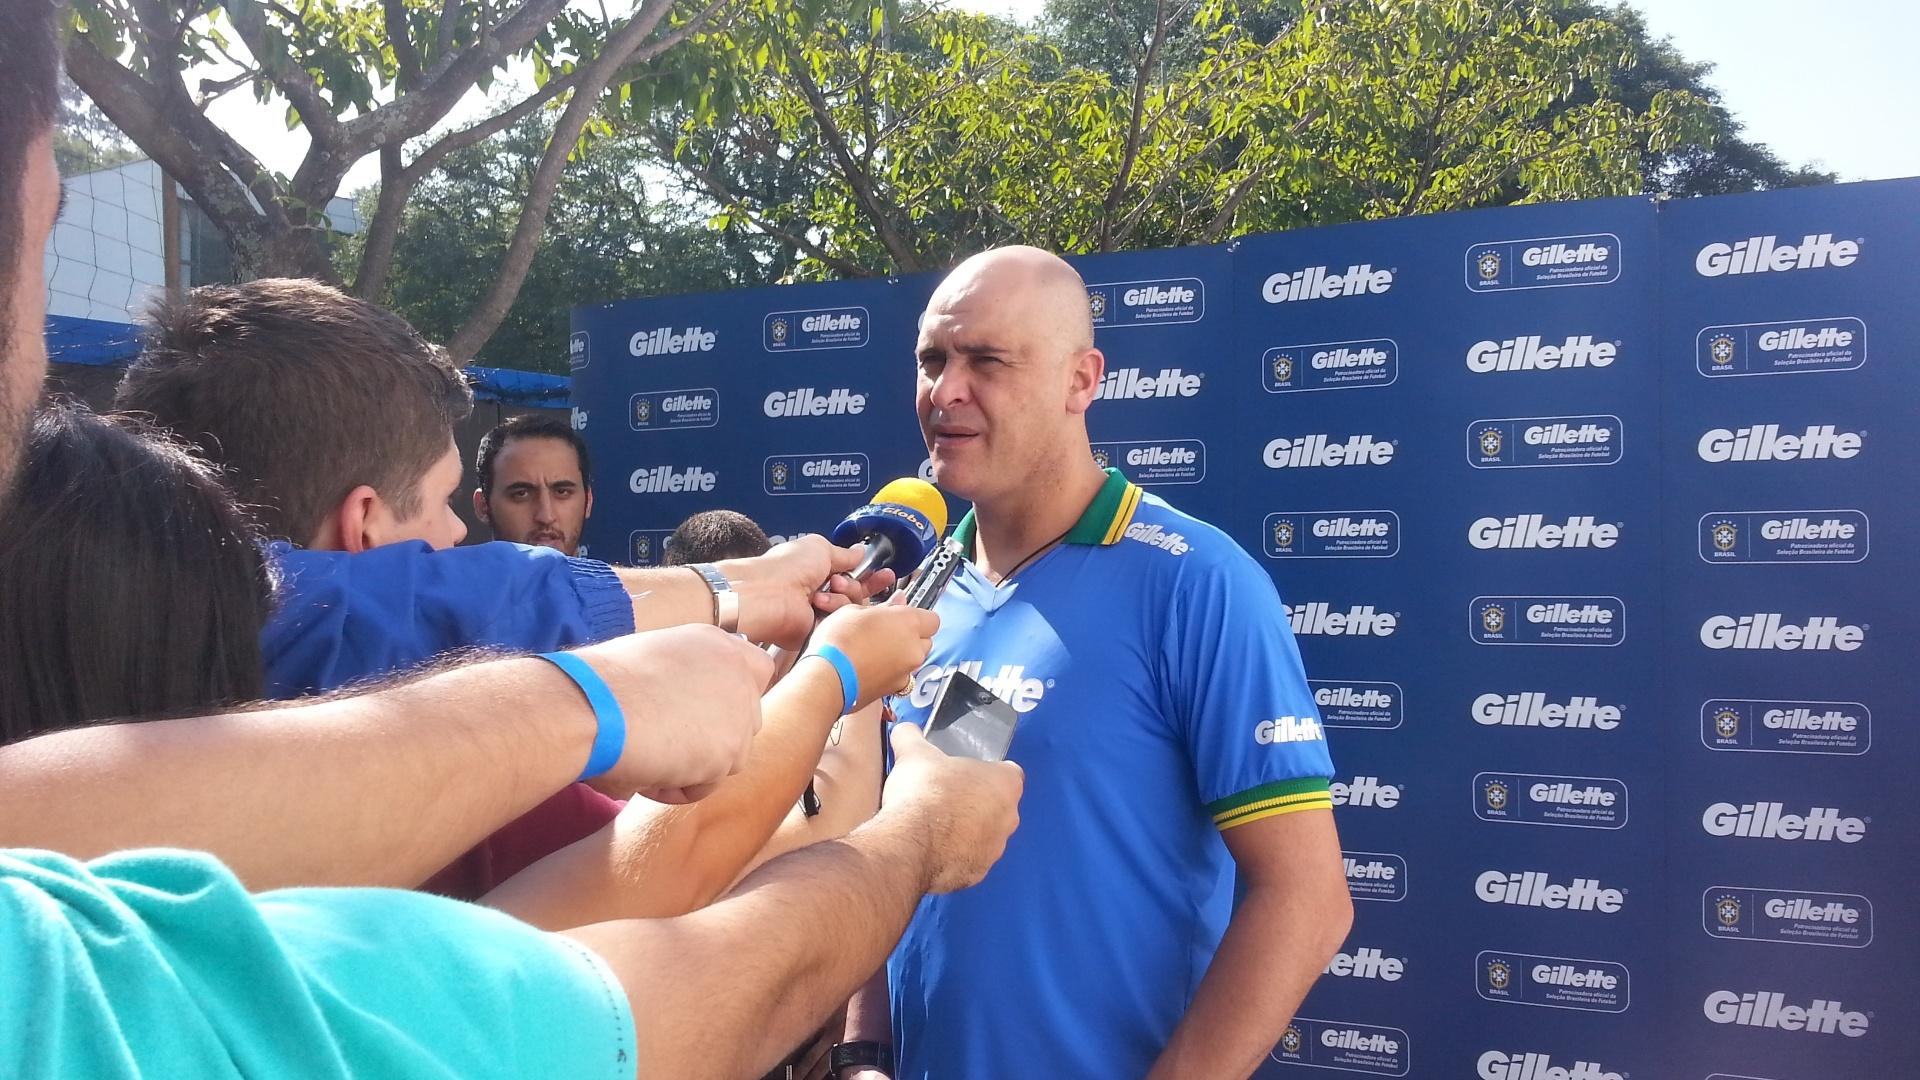 Marcos participa de evento da Gillette sobre a Copa do Mundo